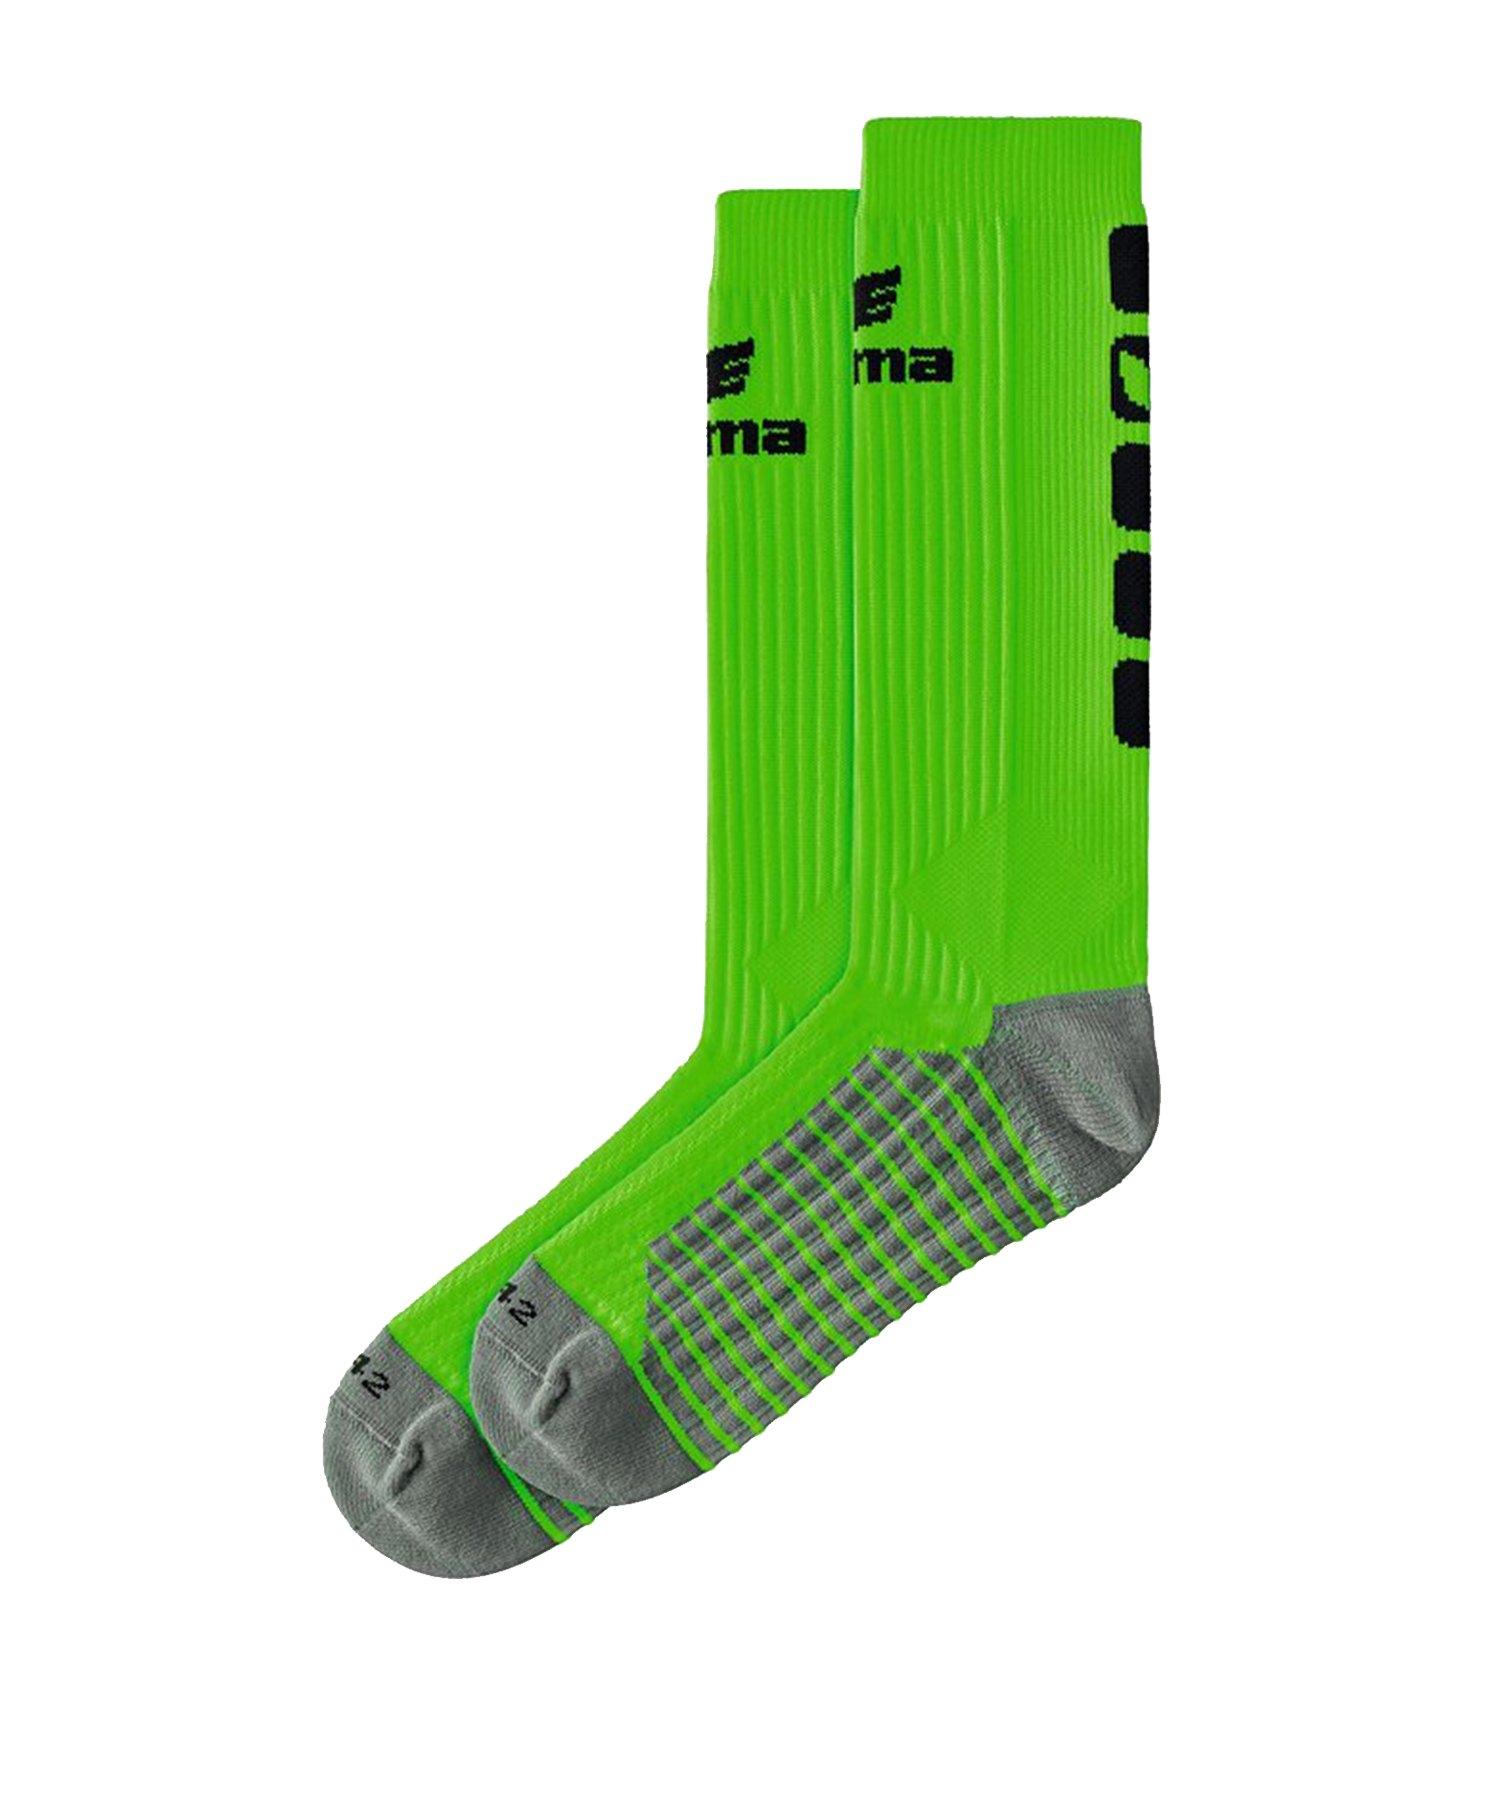 Erima CLASSIC 5-C Socken lang Grün Schwarz - Gruen